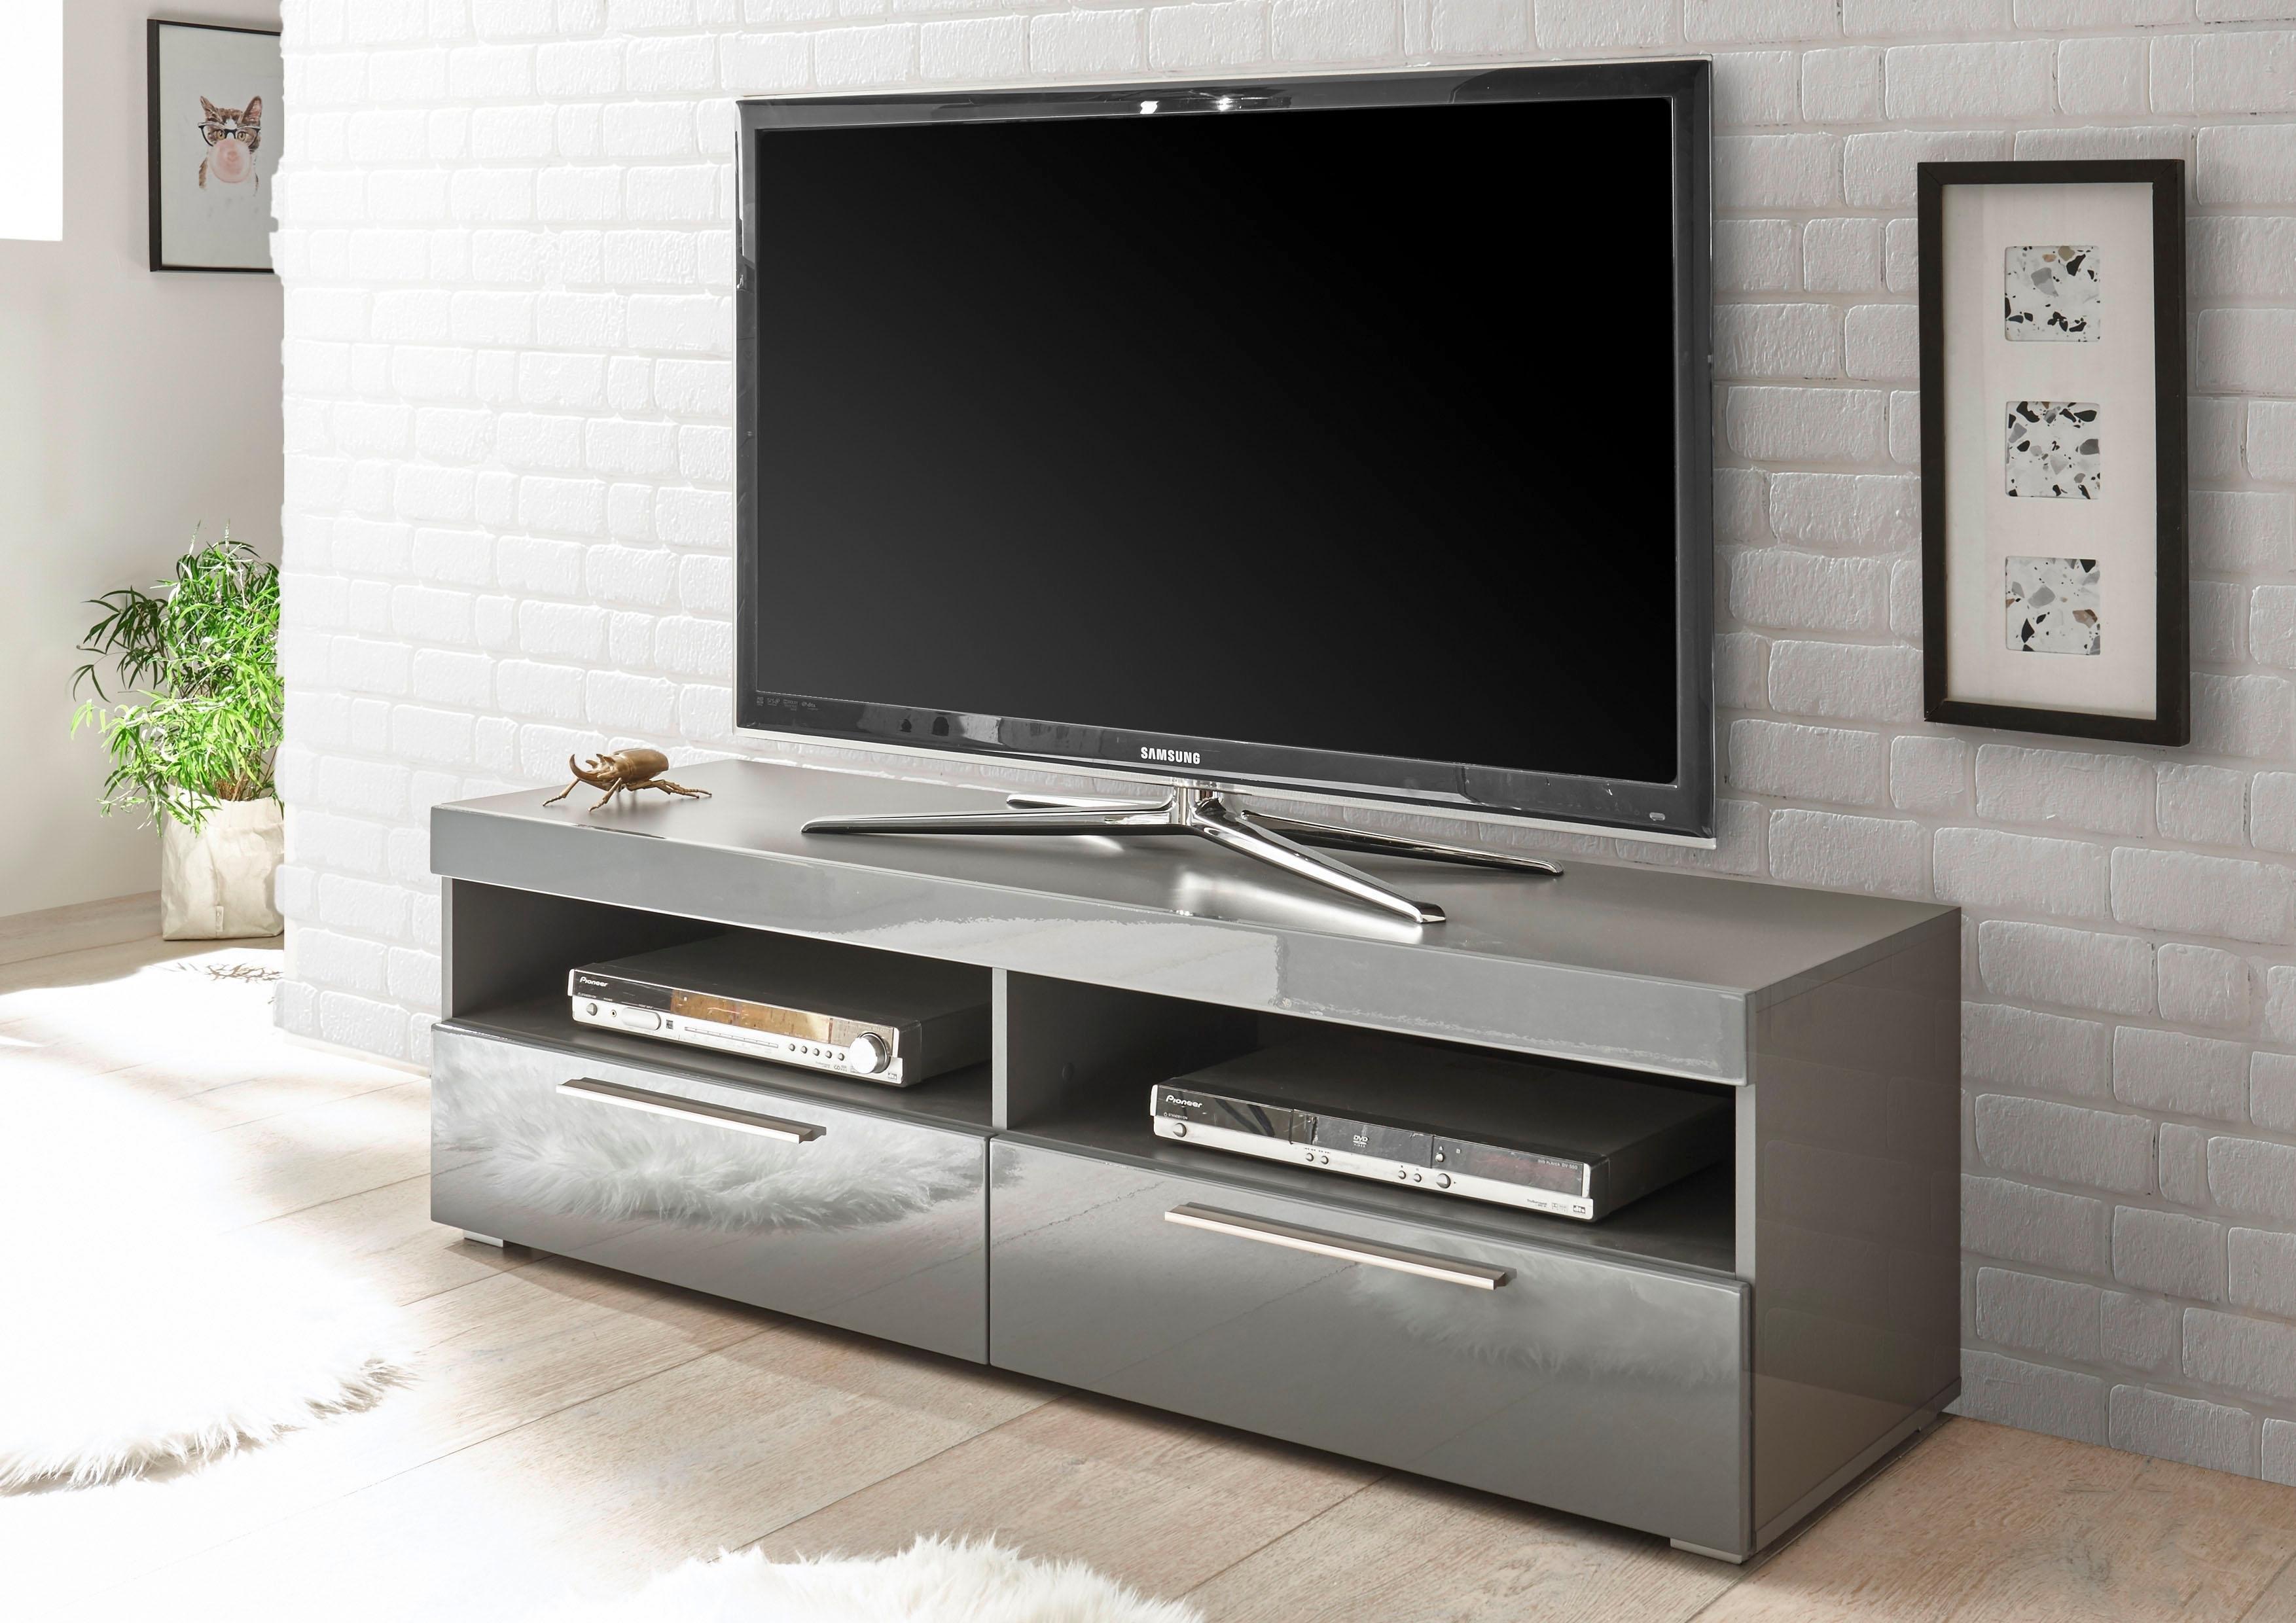 Bruno Banani tv-meubel GOBA Breedte 142 cm - verschillende betaalmethodes